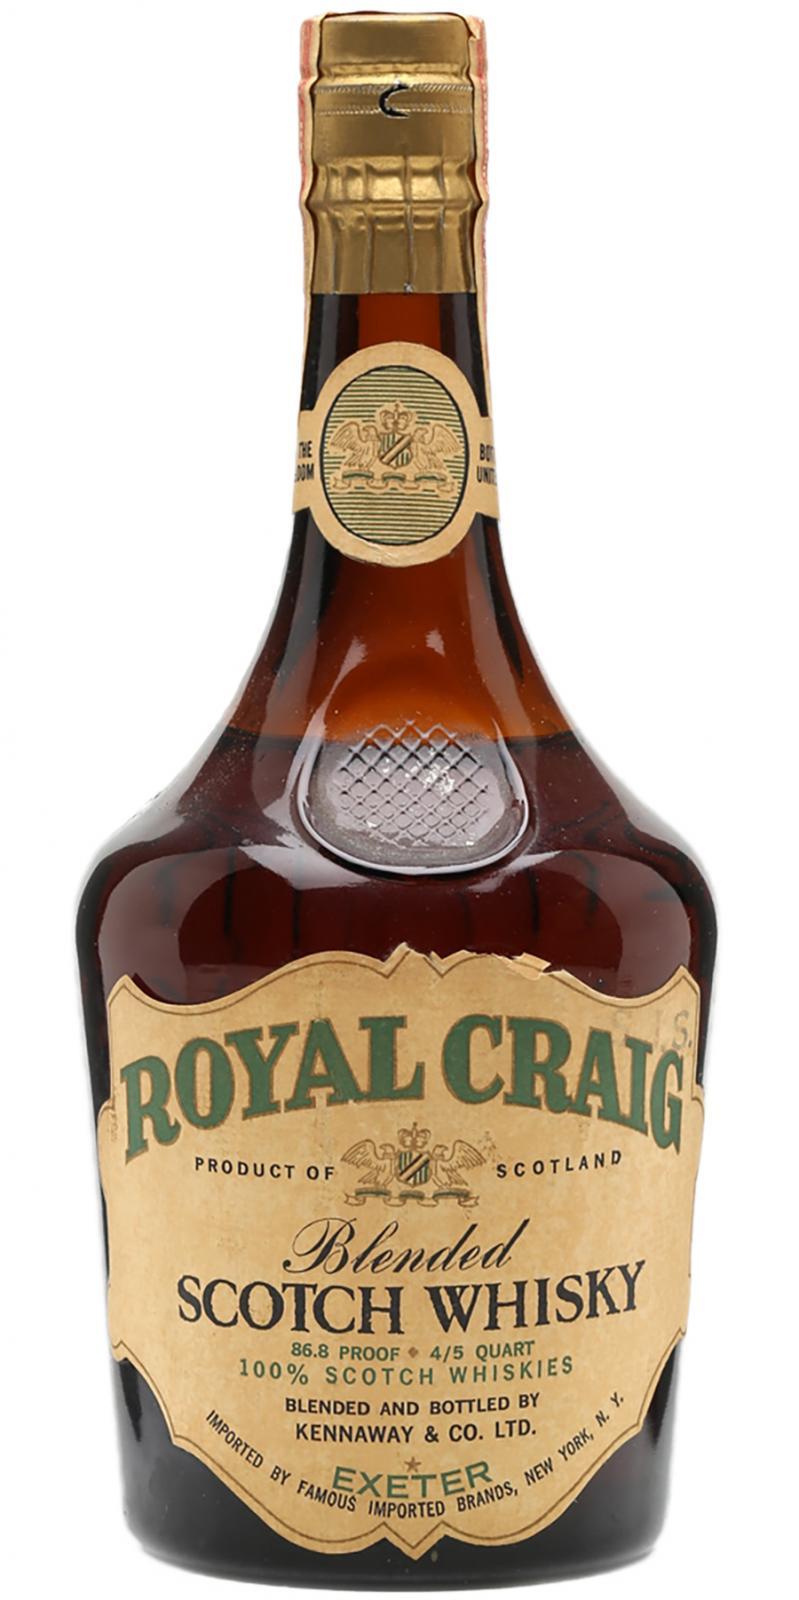 Royal Craig Blended Scotch Whisky